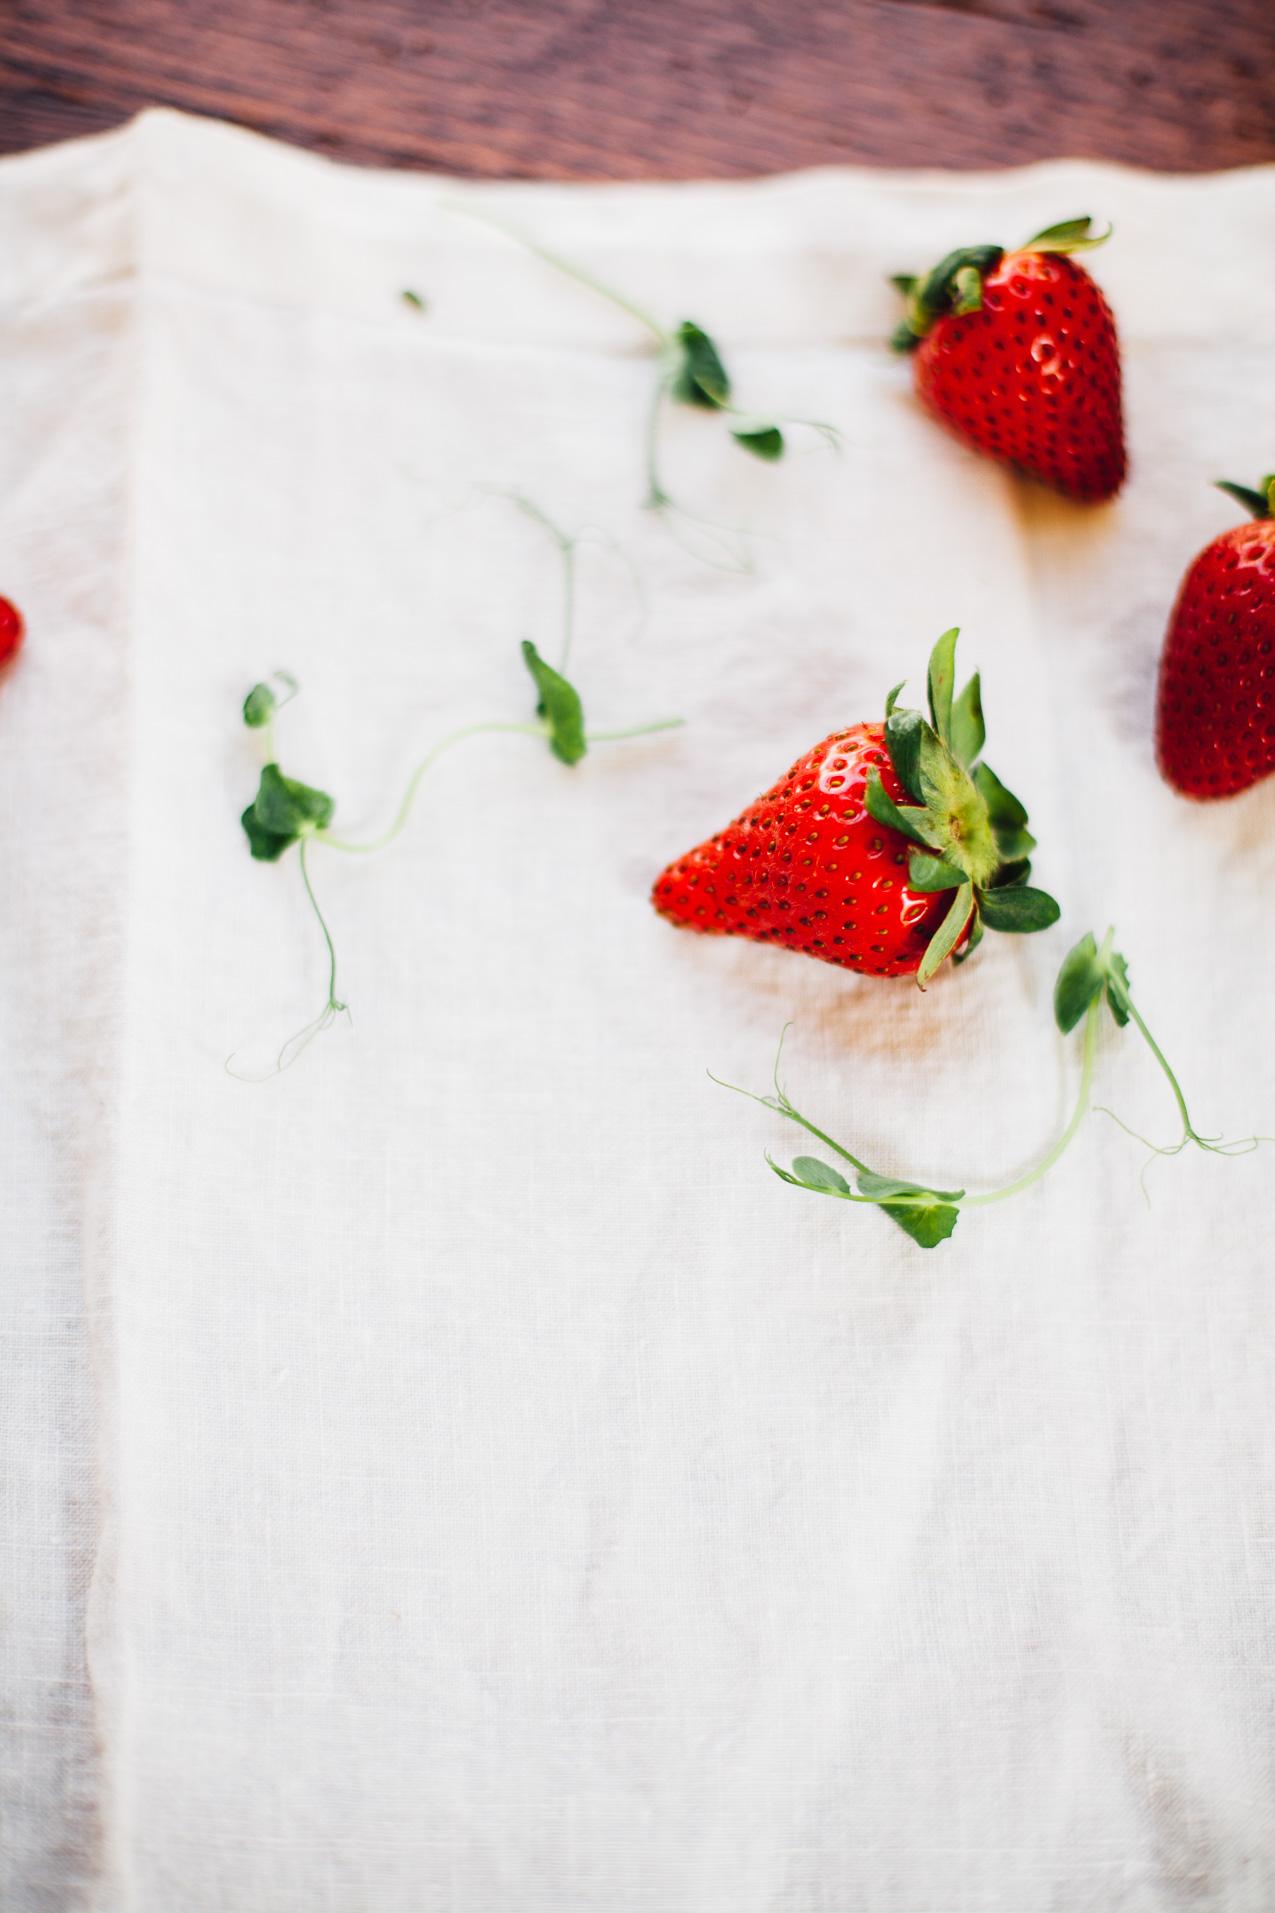 strawberry salad with spring greens and lemony hemp dressing | vegan recipe via willfrolicforfood.com